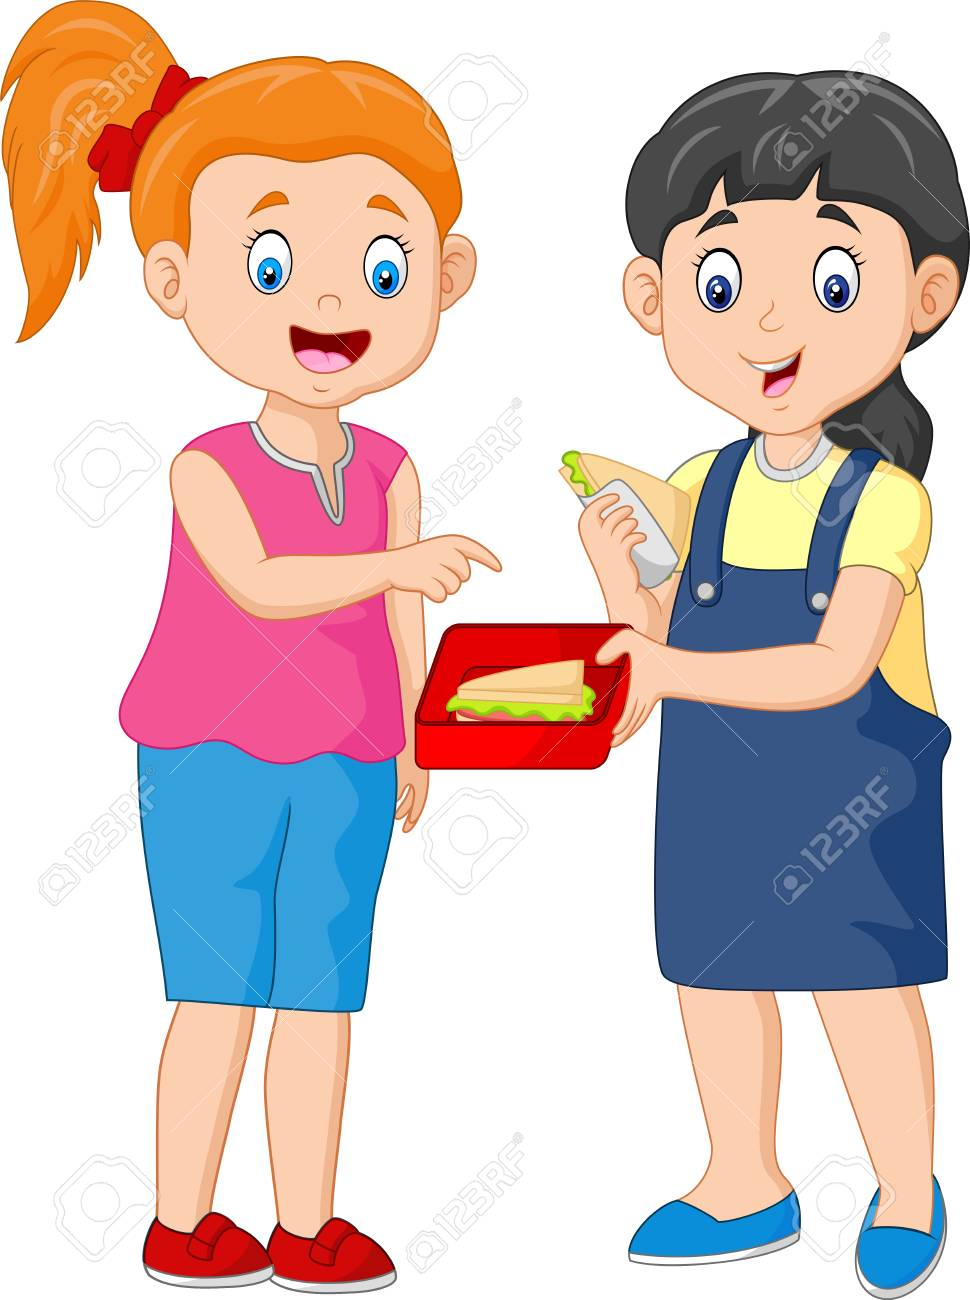 Cute Girl Sharing Sandwich with a Friend.